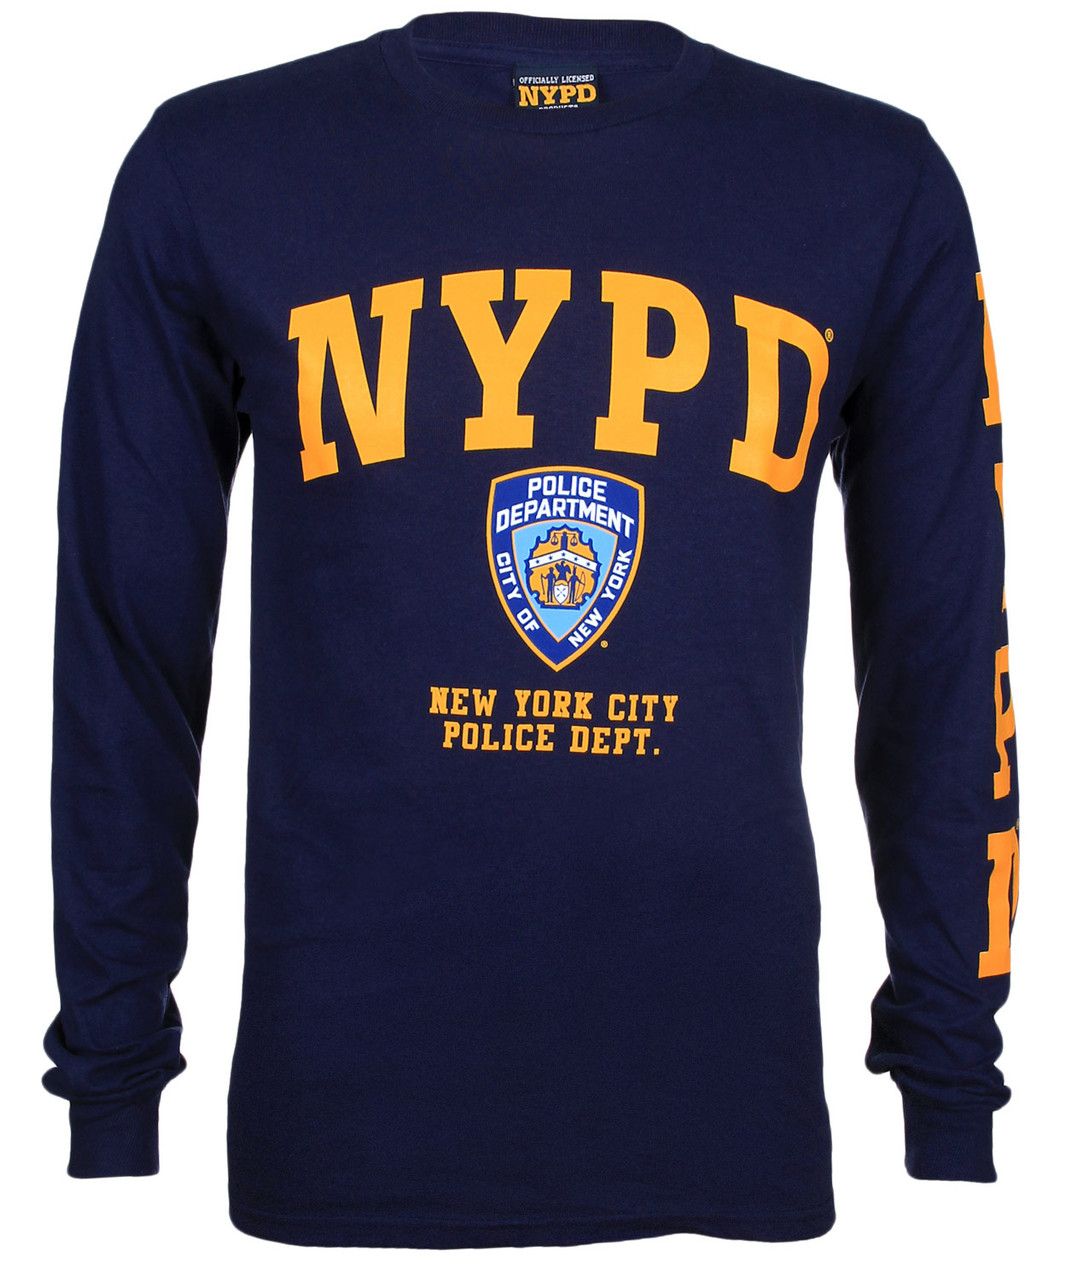 NYPD Navy Blue Sleeve Badge New York Police Department T-shirt Tee Men Unisex